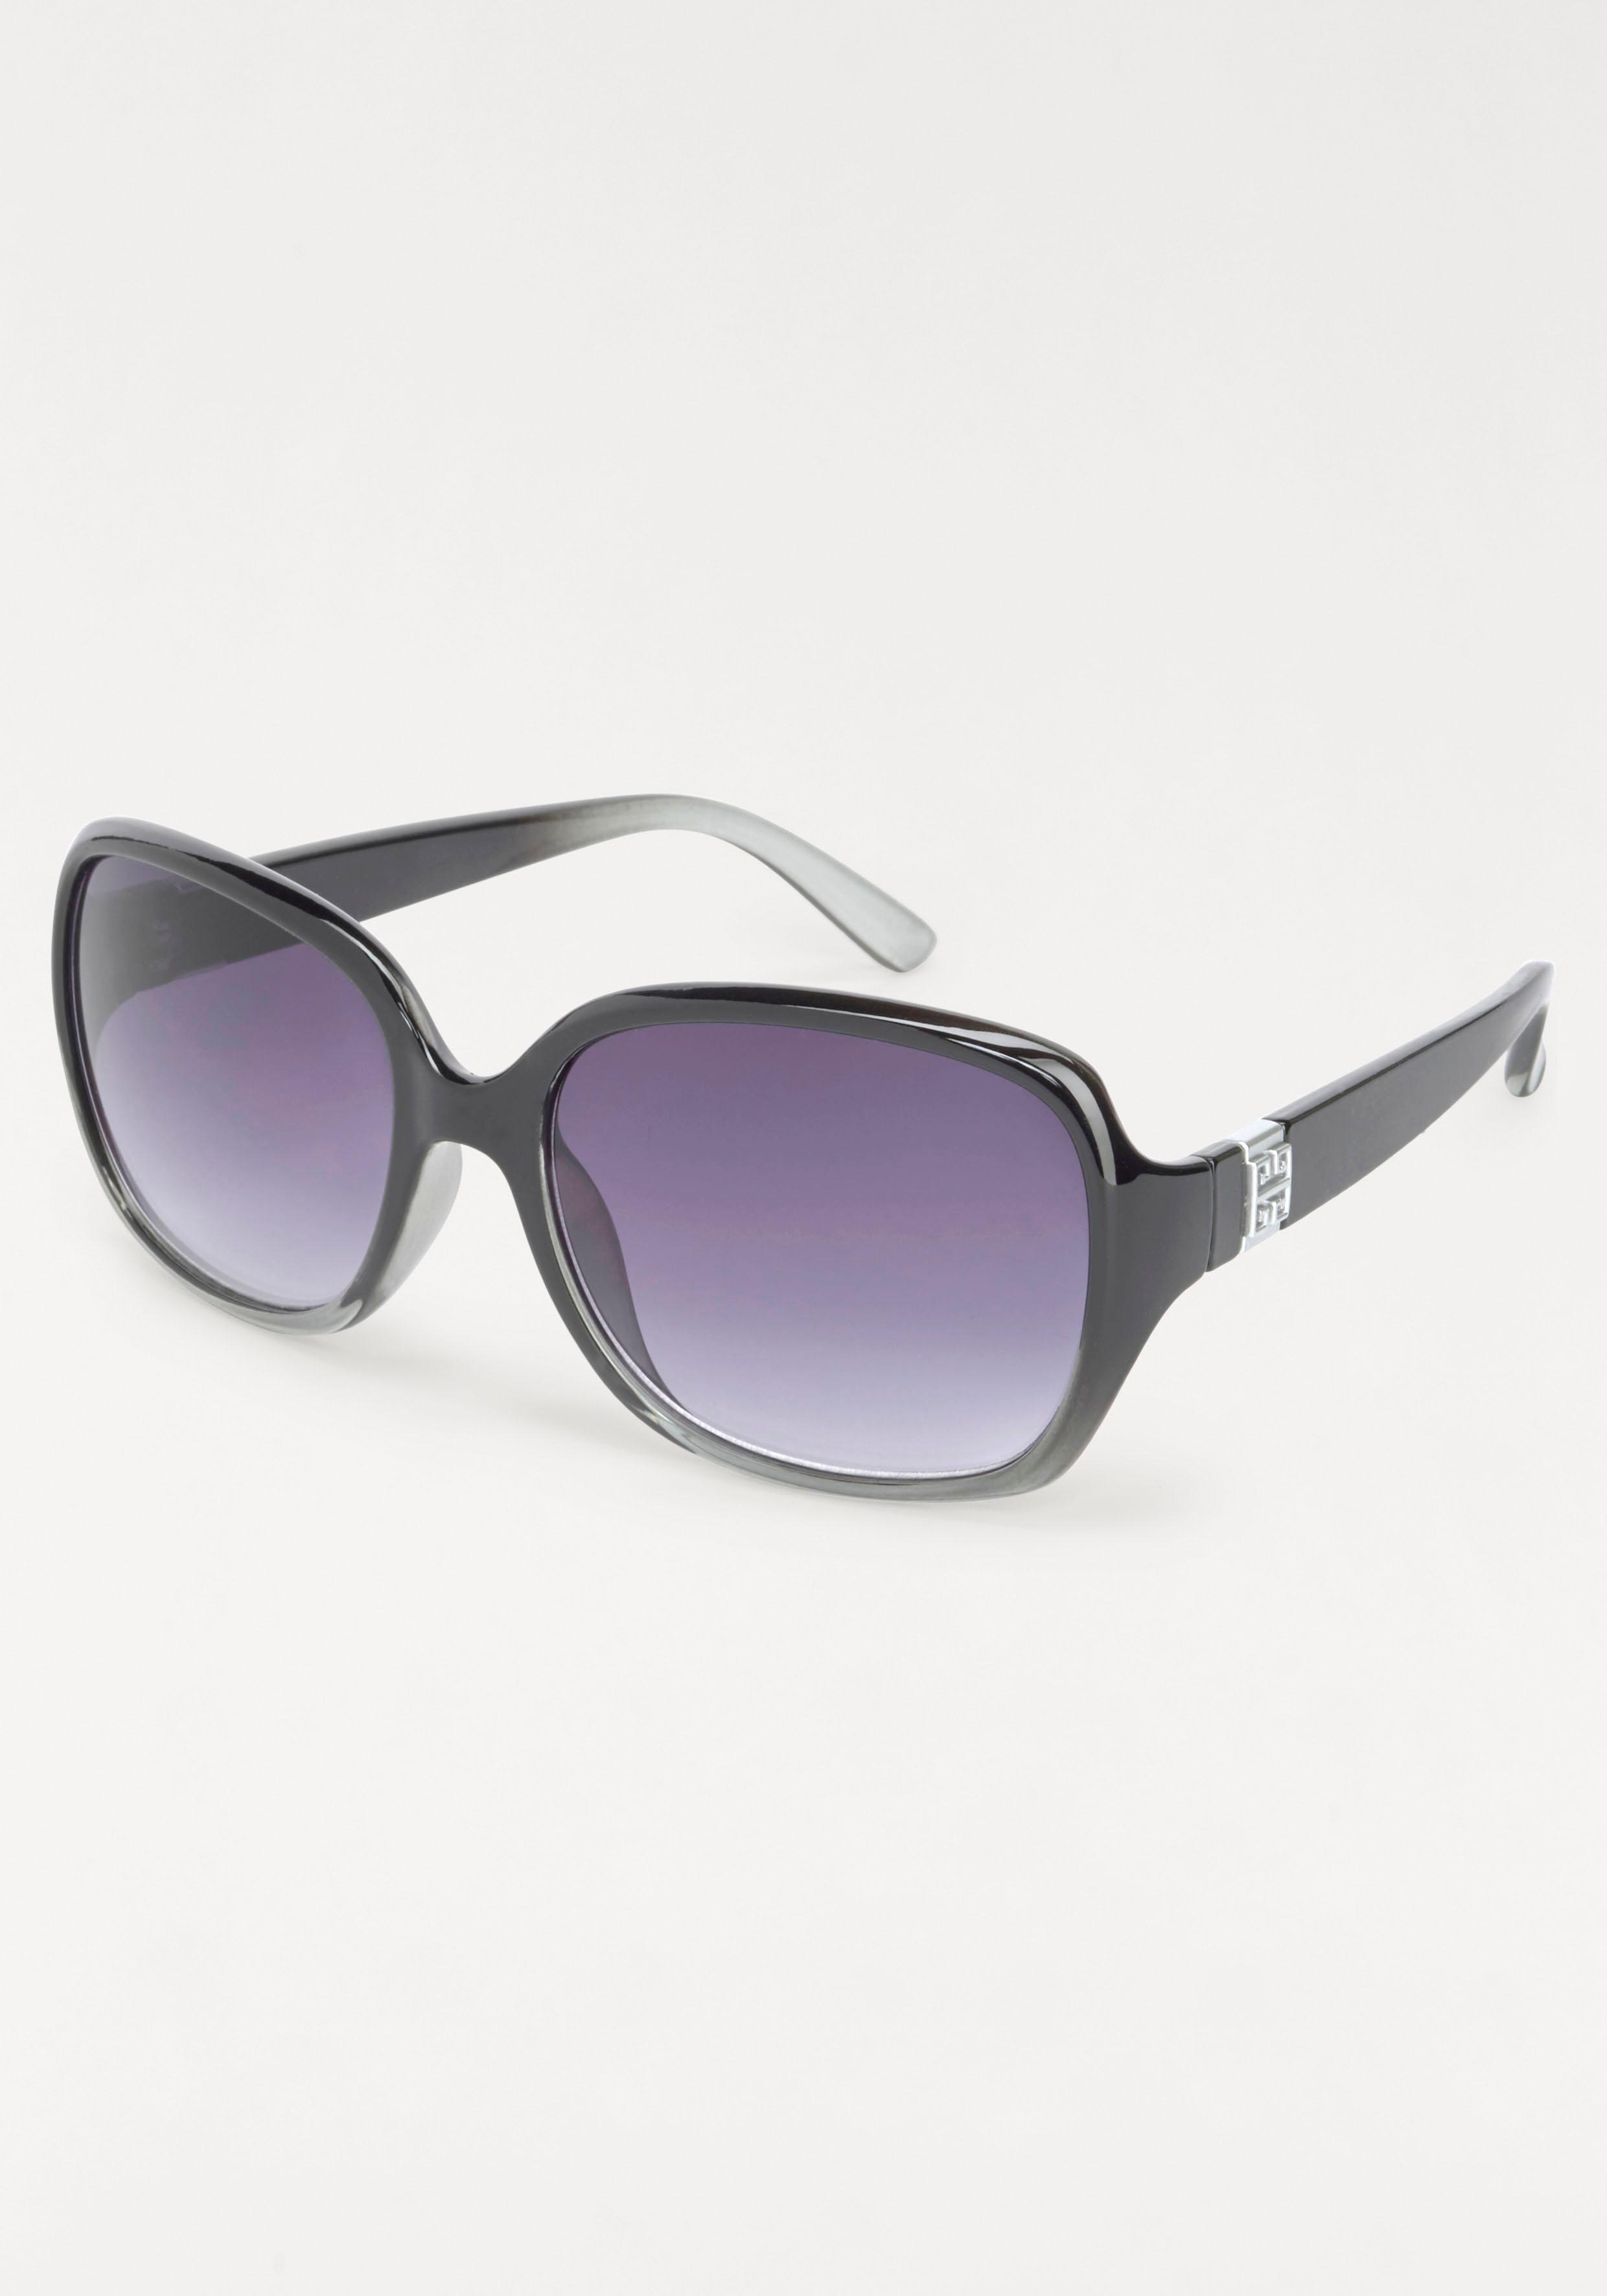 J.Jayz JJayz Sonnenbrille Damenmode/Schmuck & Accessoires/Accessoires/Sonnenbrillen/Ovale Sonnenbrille